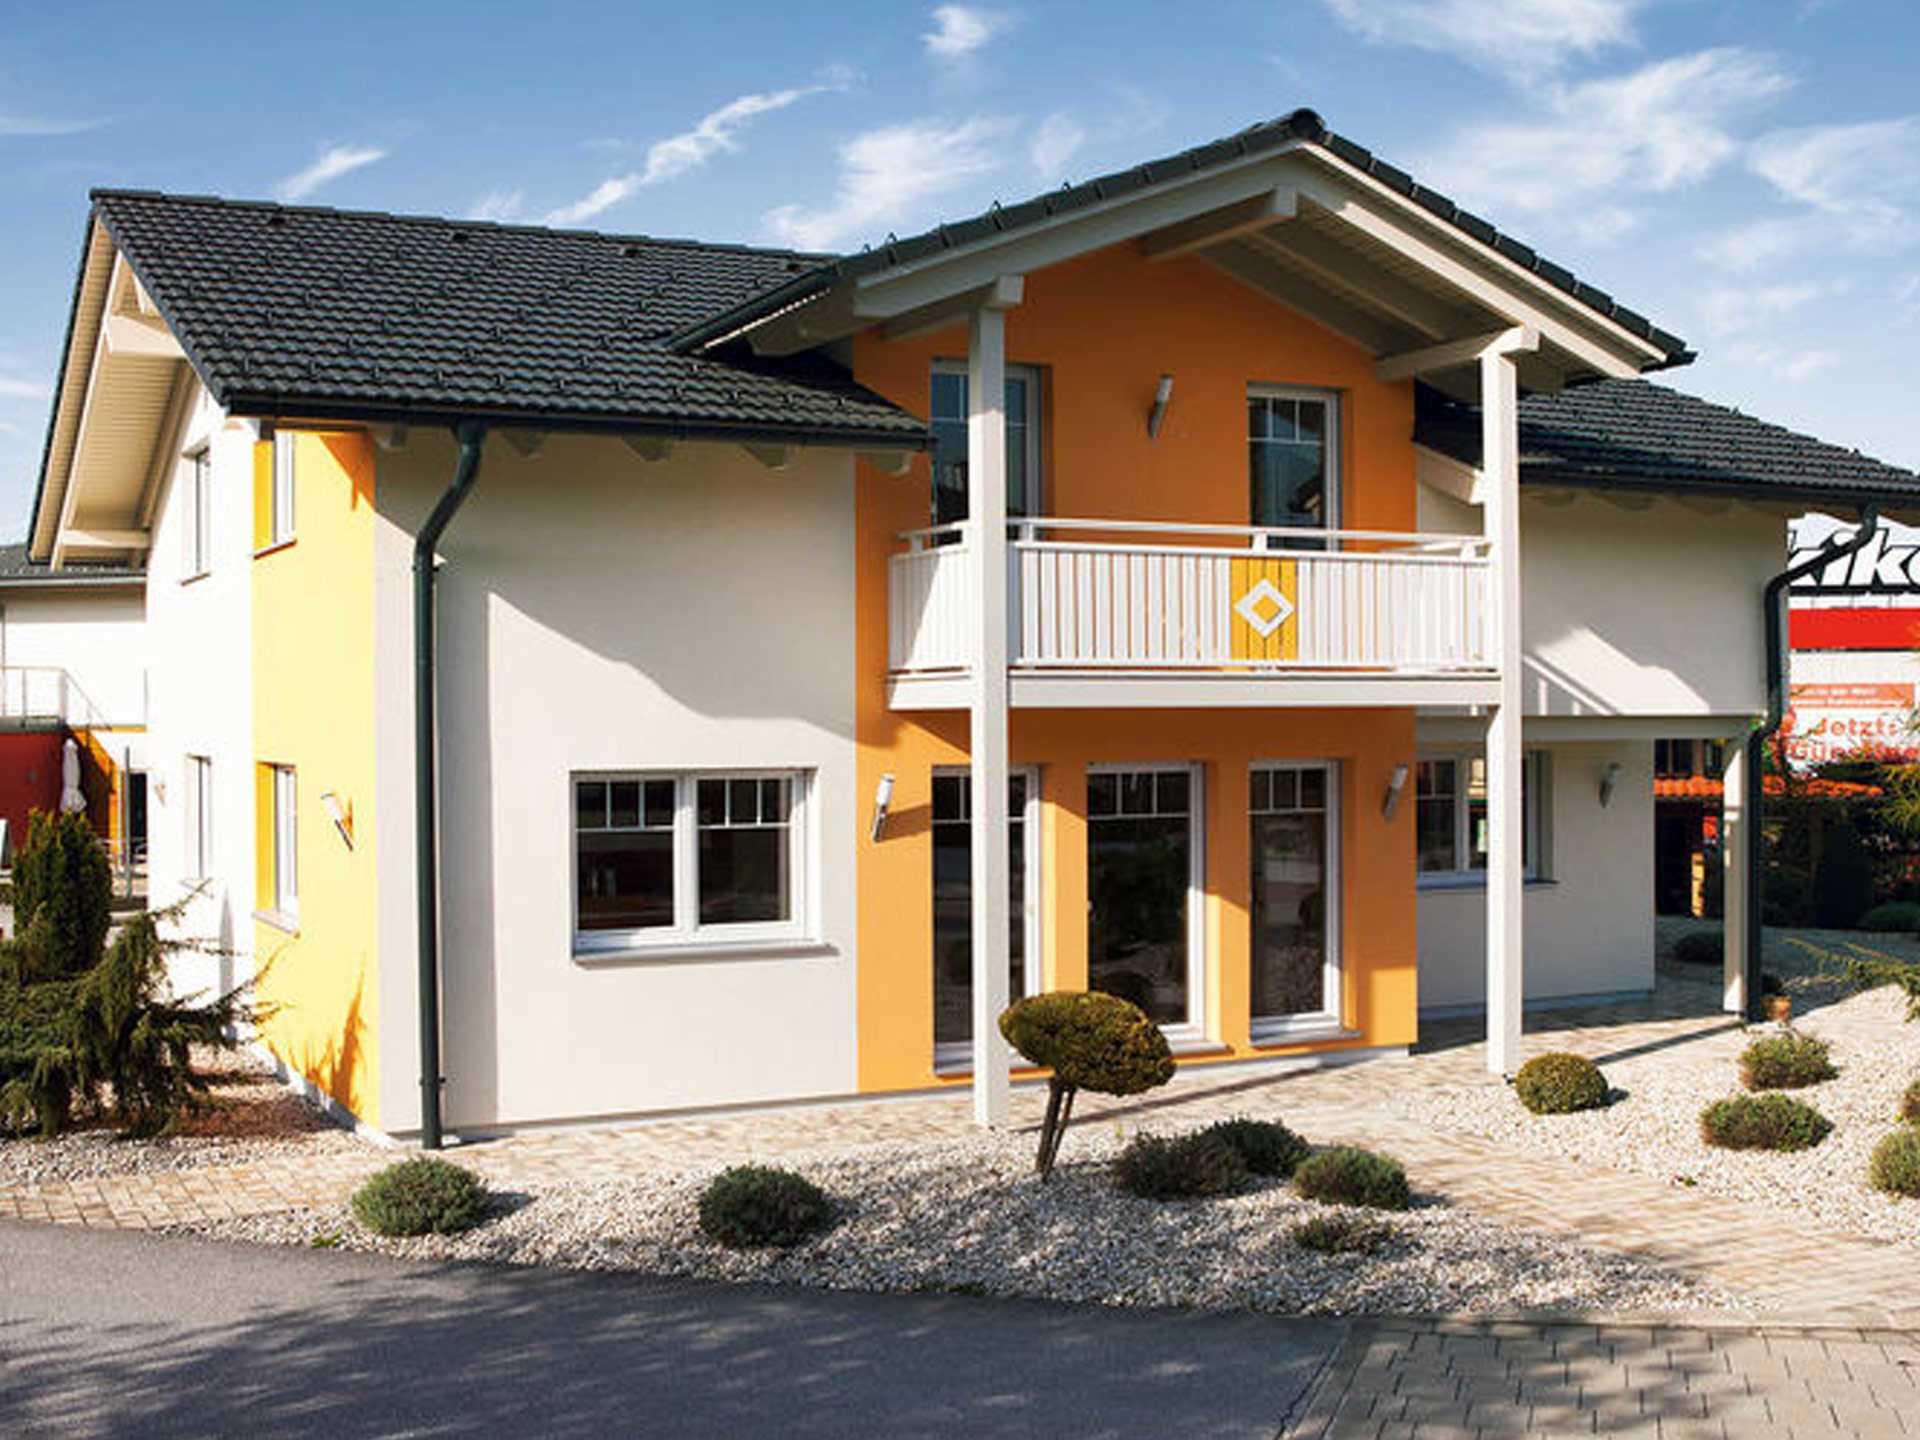 Musterhauspark In Eugendorf